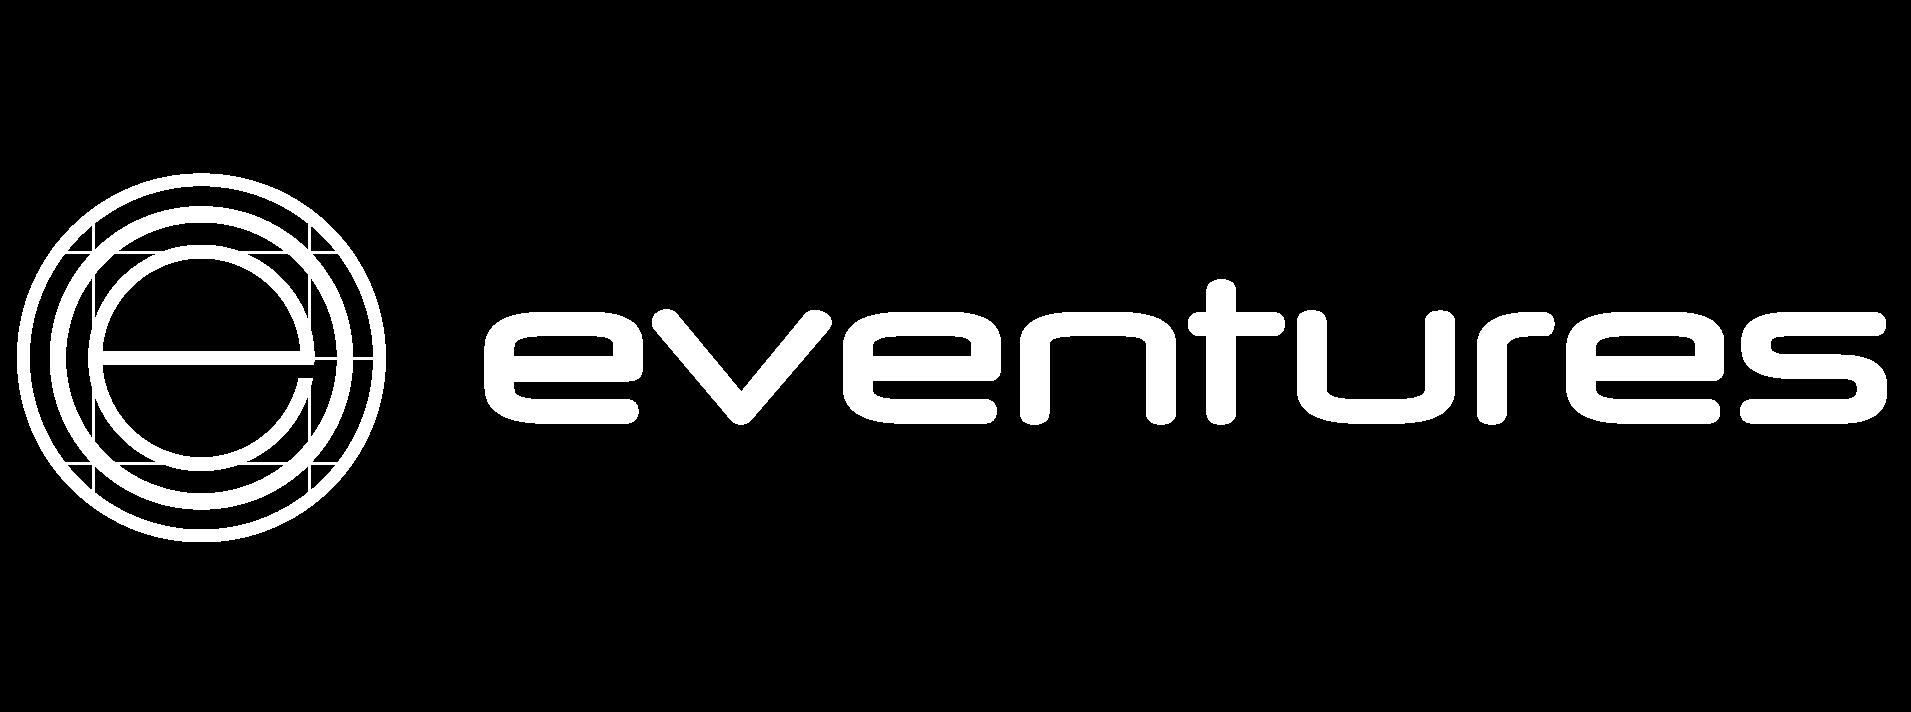 eventures - ボーダレスコミュニケーションプラットフォーマー -